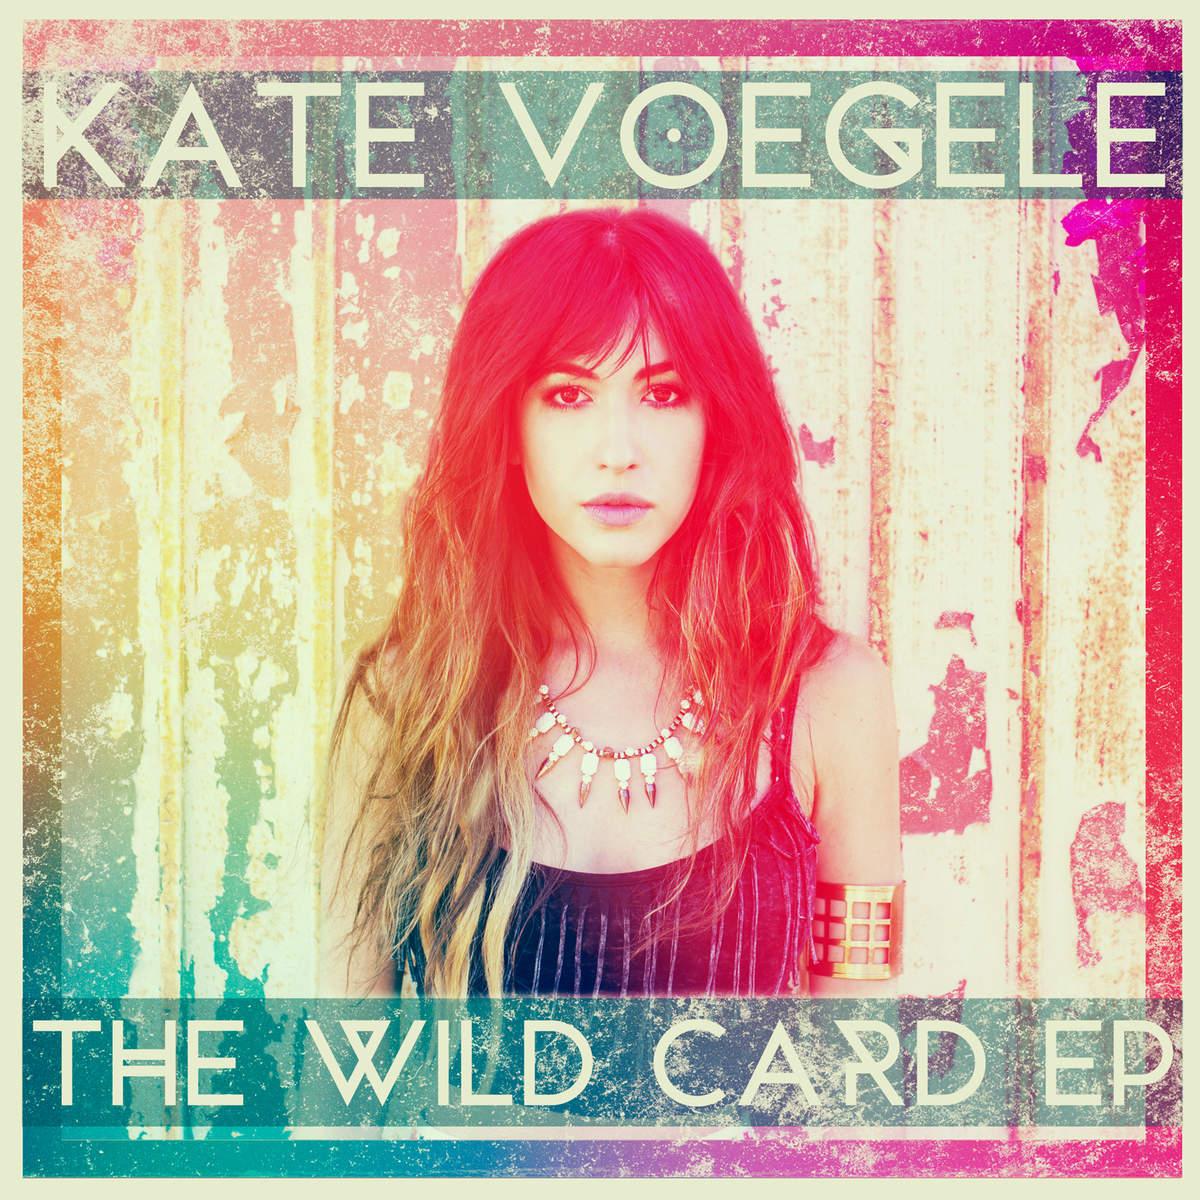 Kate Voegele's new album Wild Card >>> It's so simple yet so good ❤️